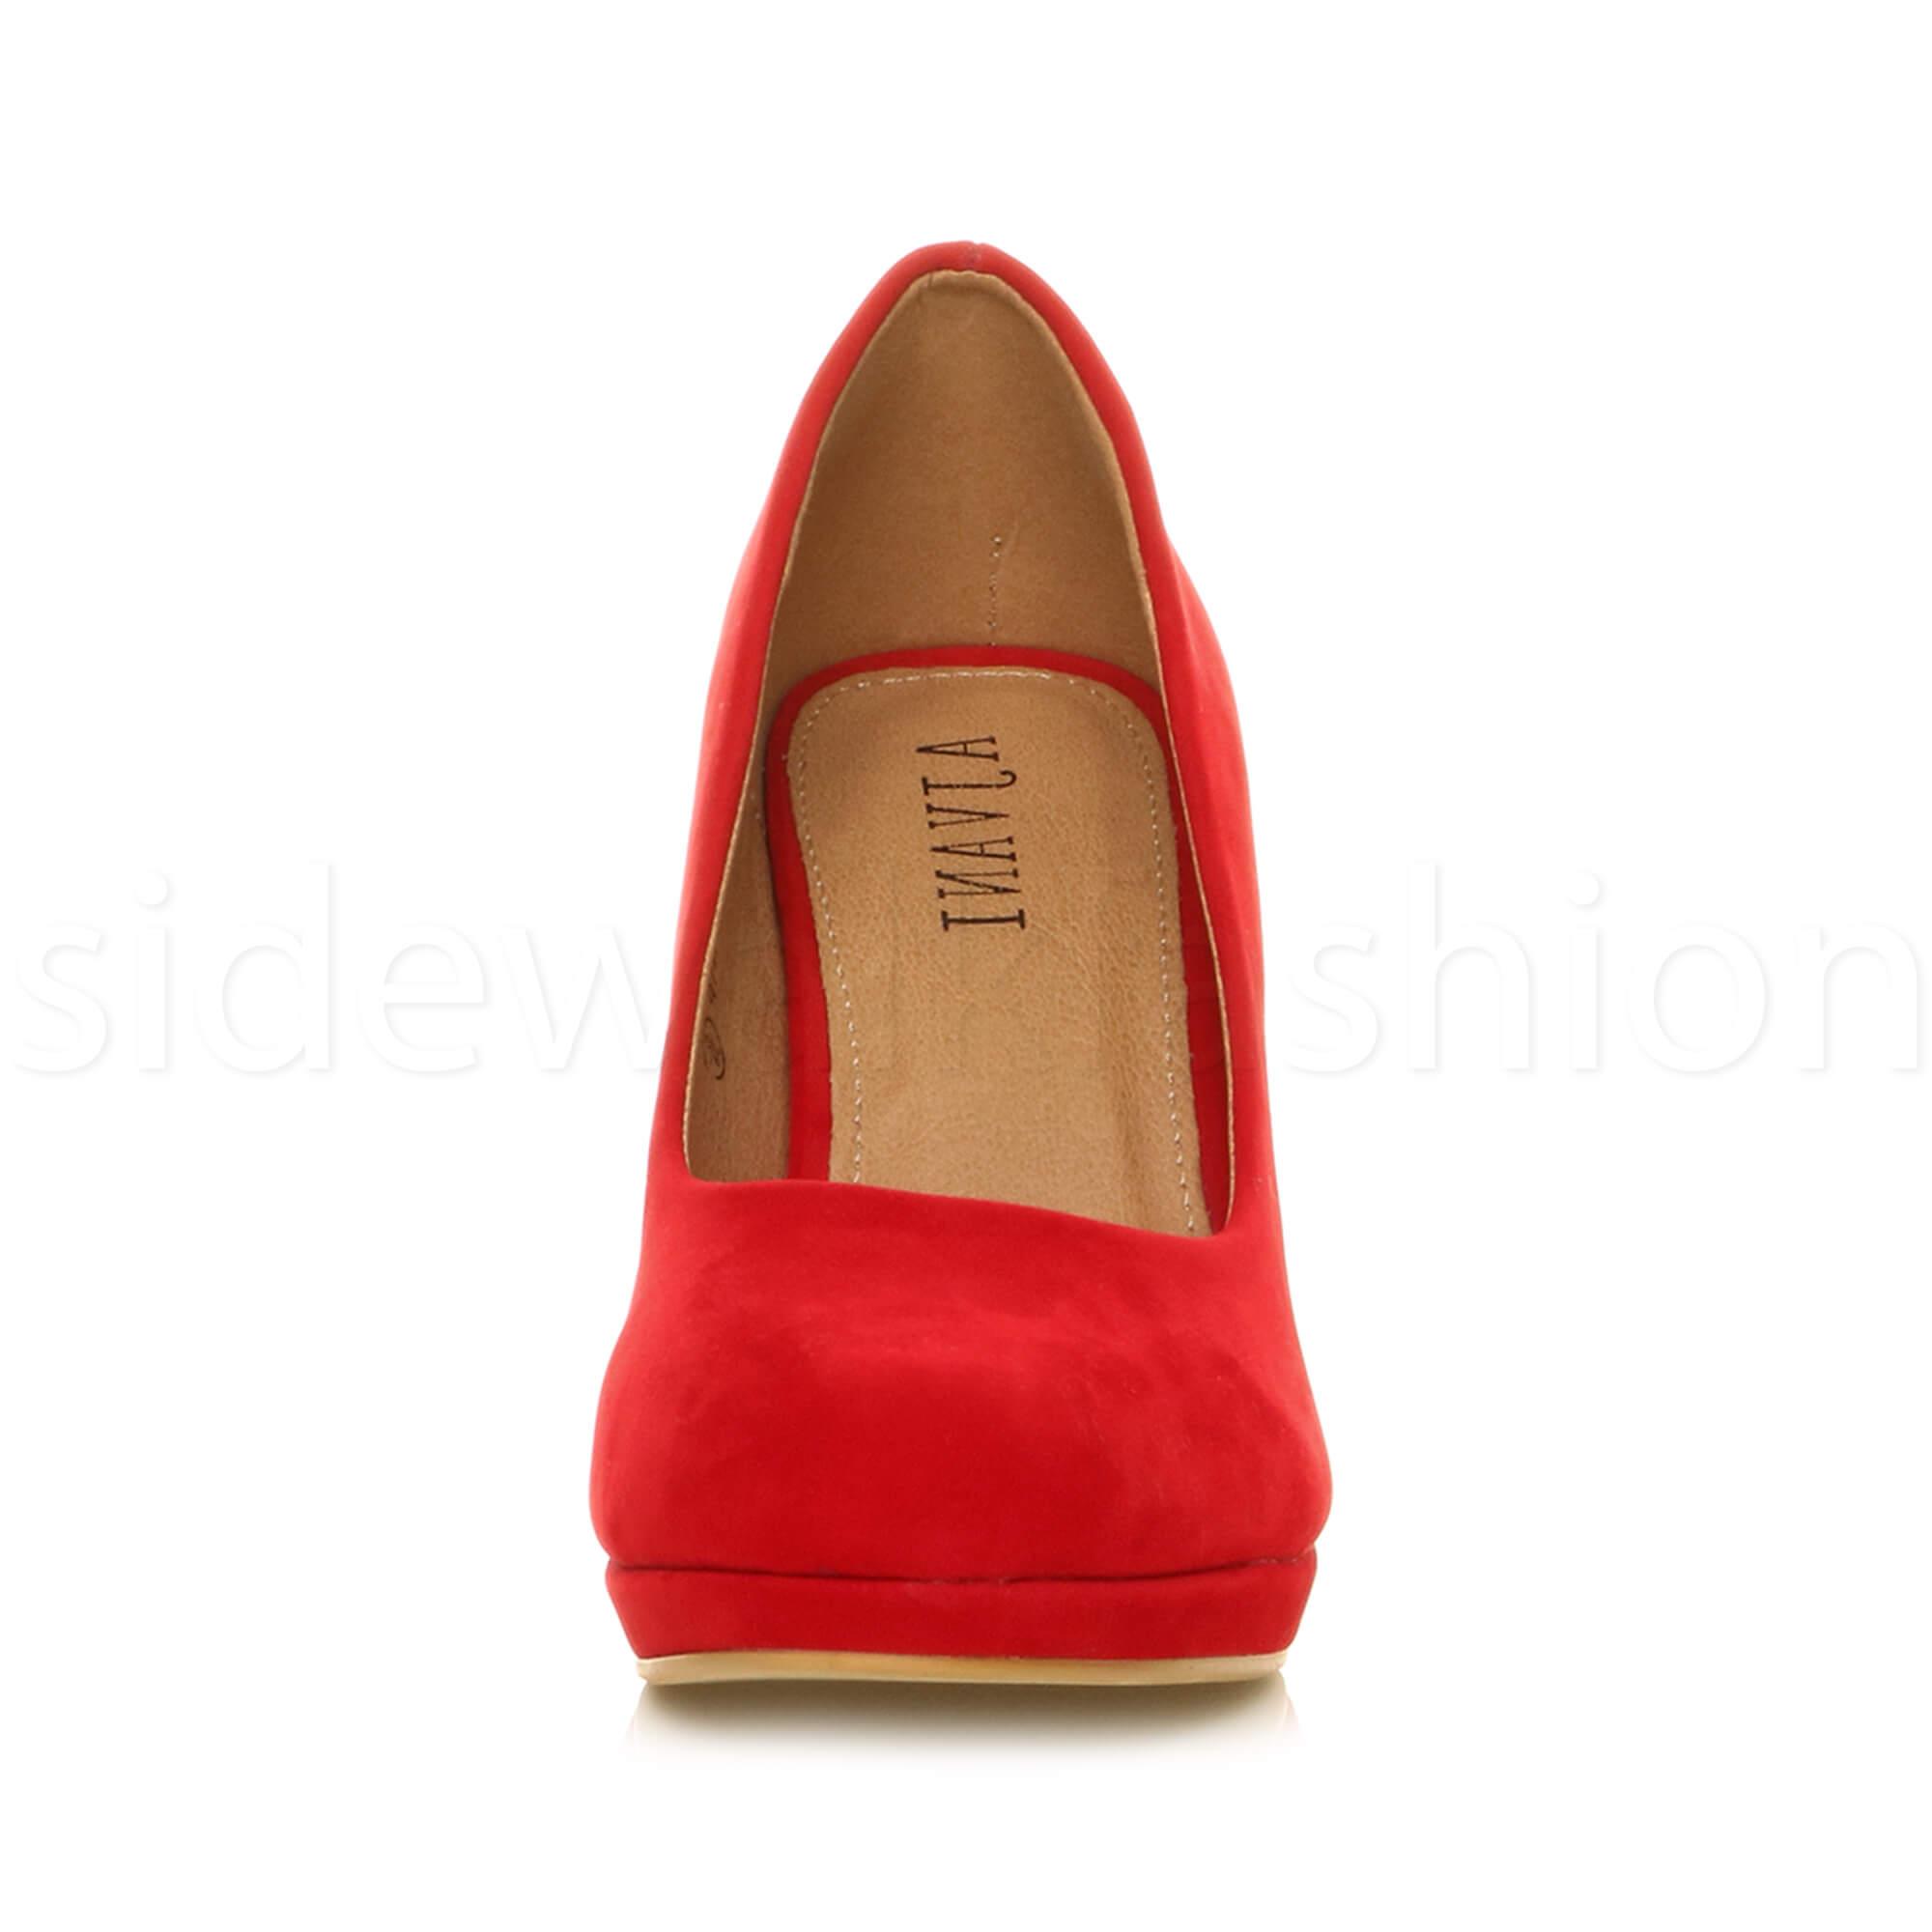 Womens-ladies-high-mid-heel-platform-wedding-evening-bridesmaid-court-shoes-size thumbnail 153